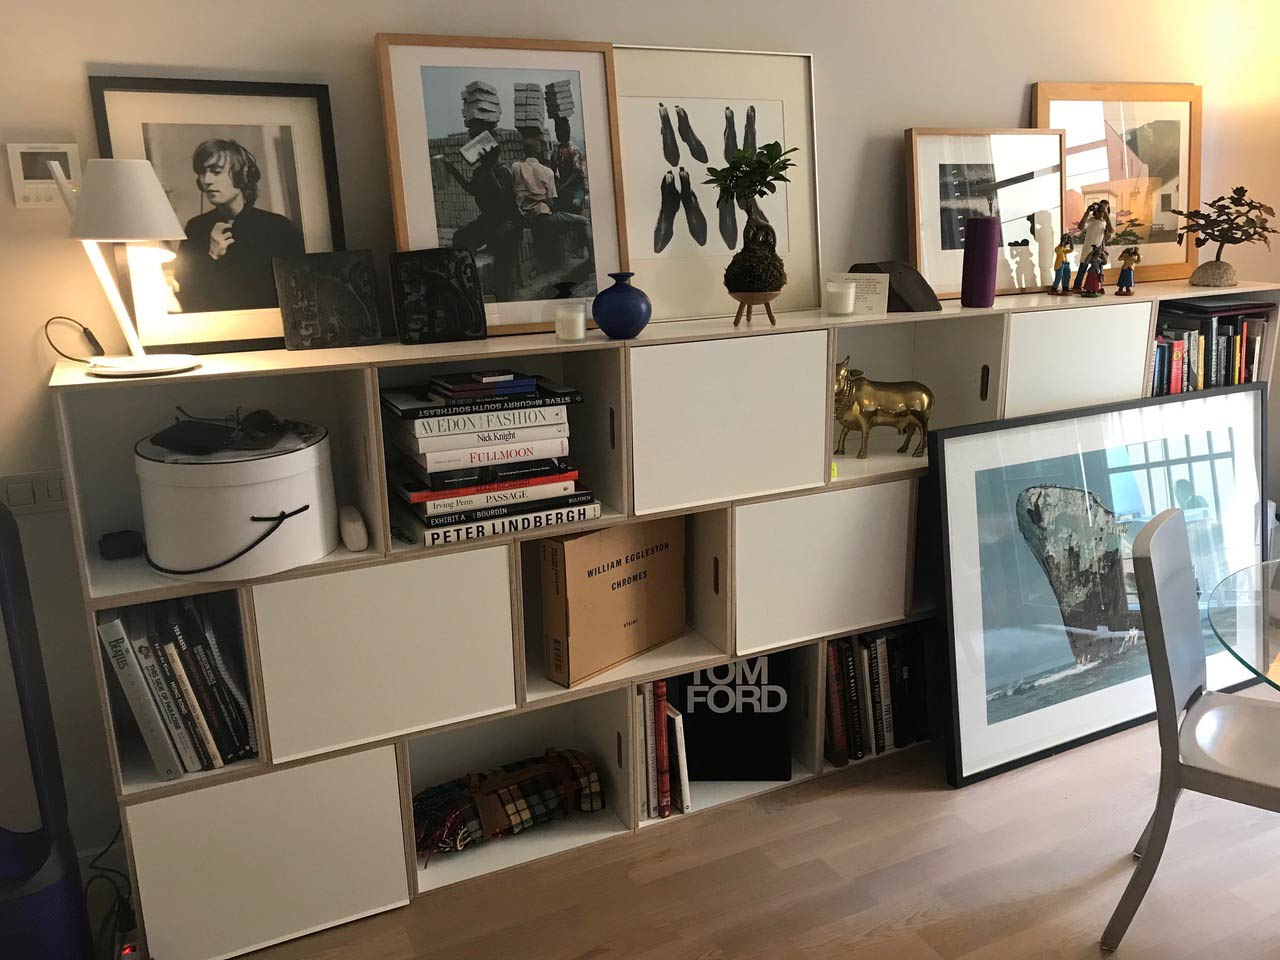 Mueble modular para salón formado por BrickBox XL, estantería de madera para guardar grandes libros.